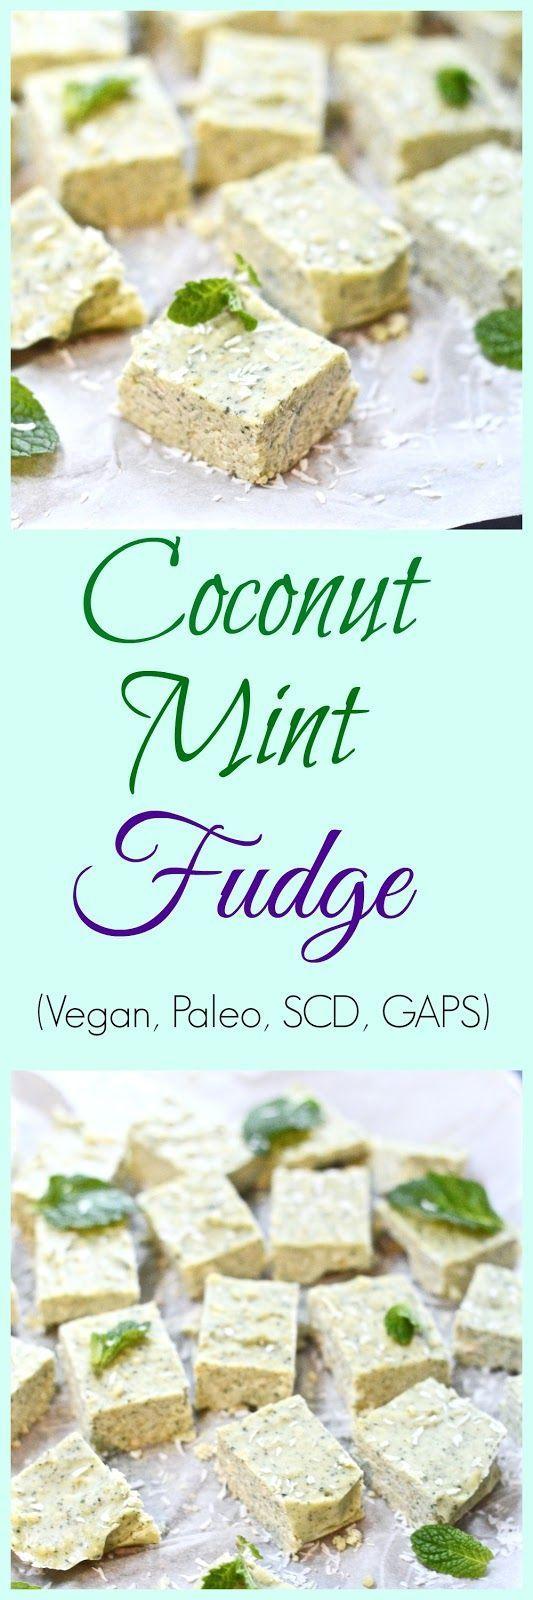 Pure and Simple Nourishment : Coconut Mint Fudge (Paleo, Vegan, SCD, GAPS)